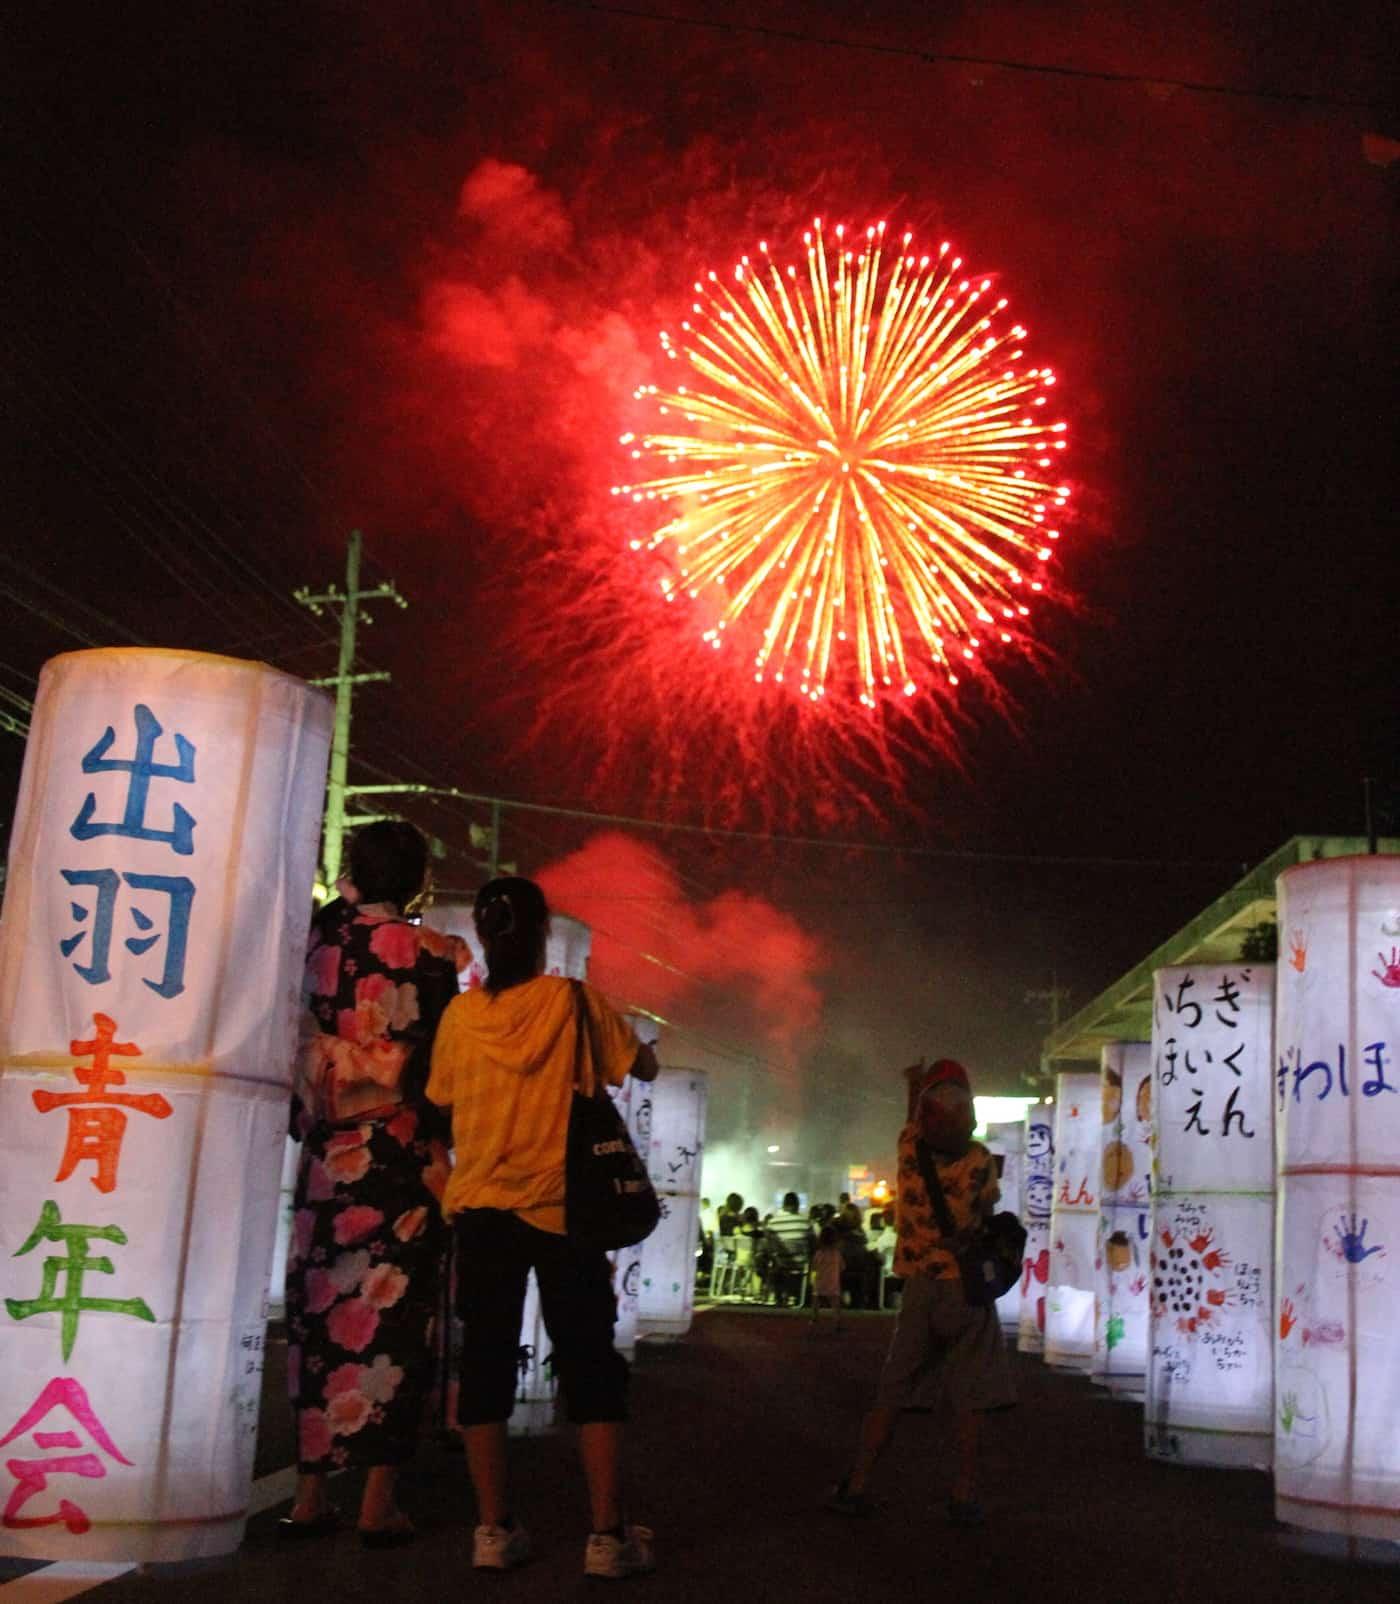 Fireworks at Mizuho Summer Festival in Izuwa in Ohnan, Shimane